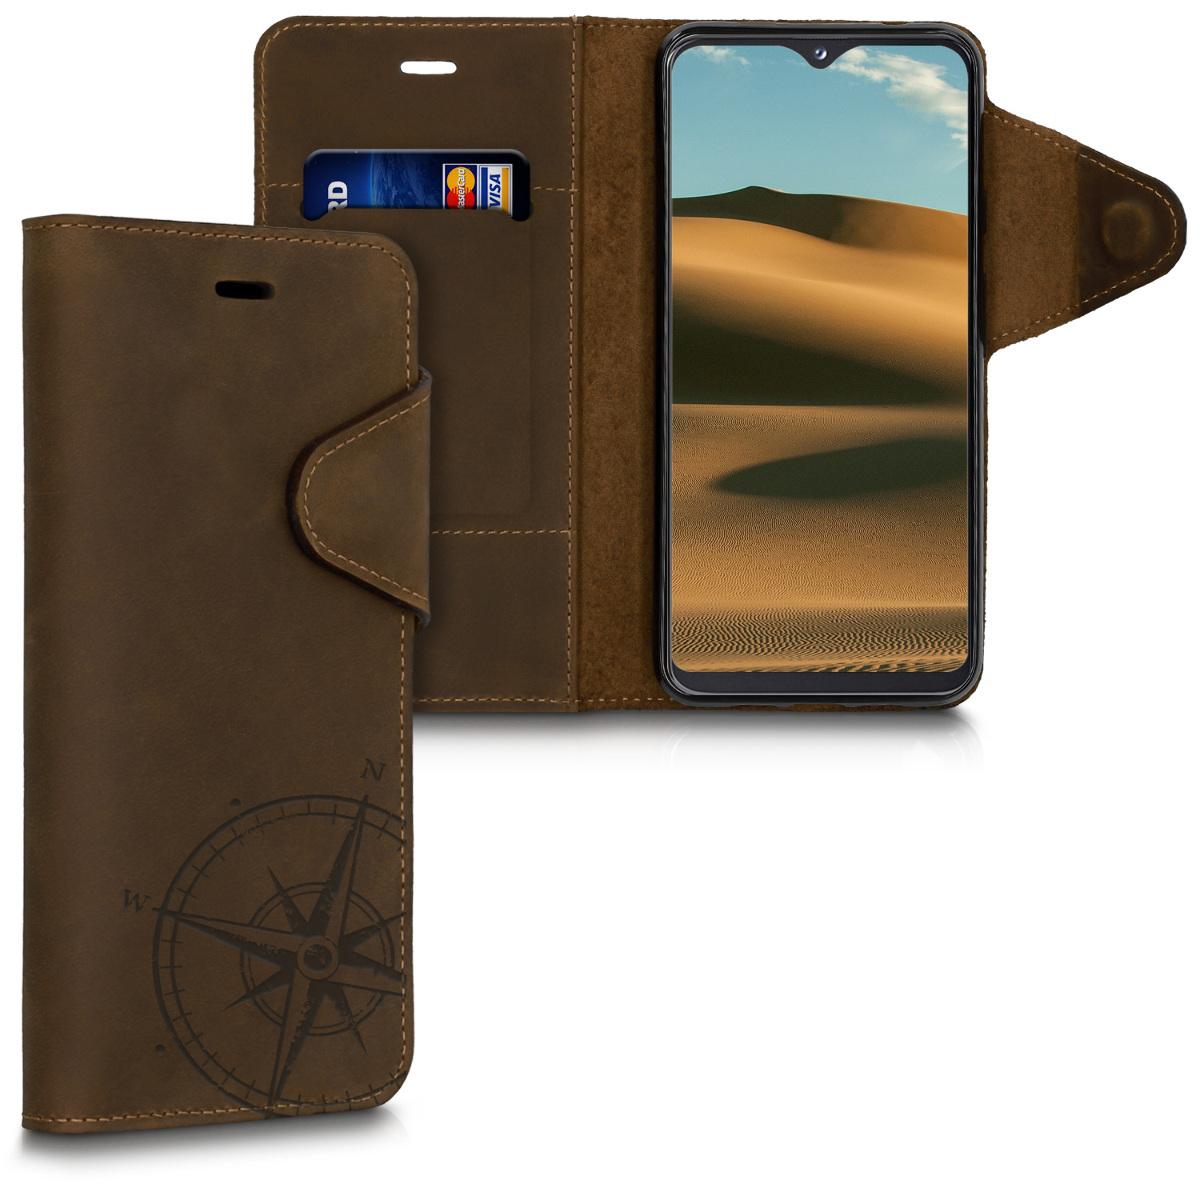 Kalibri Δερμάτινη Suede Θήκη - Πορτοφόλι Samsung Galaxy A20e - Brown (49625.01)